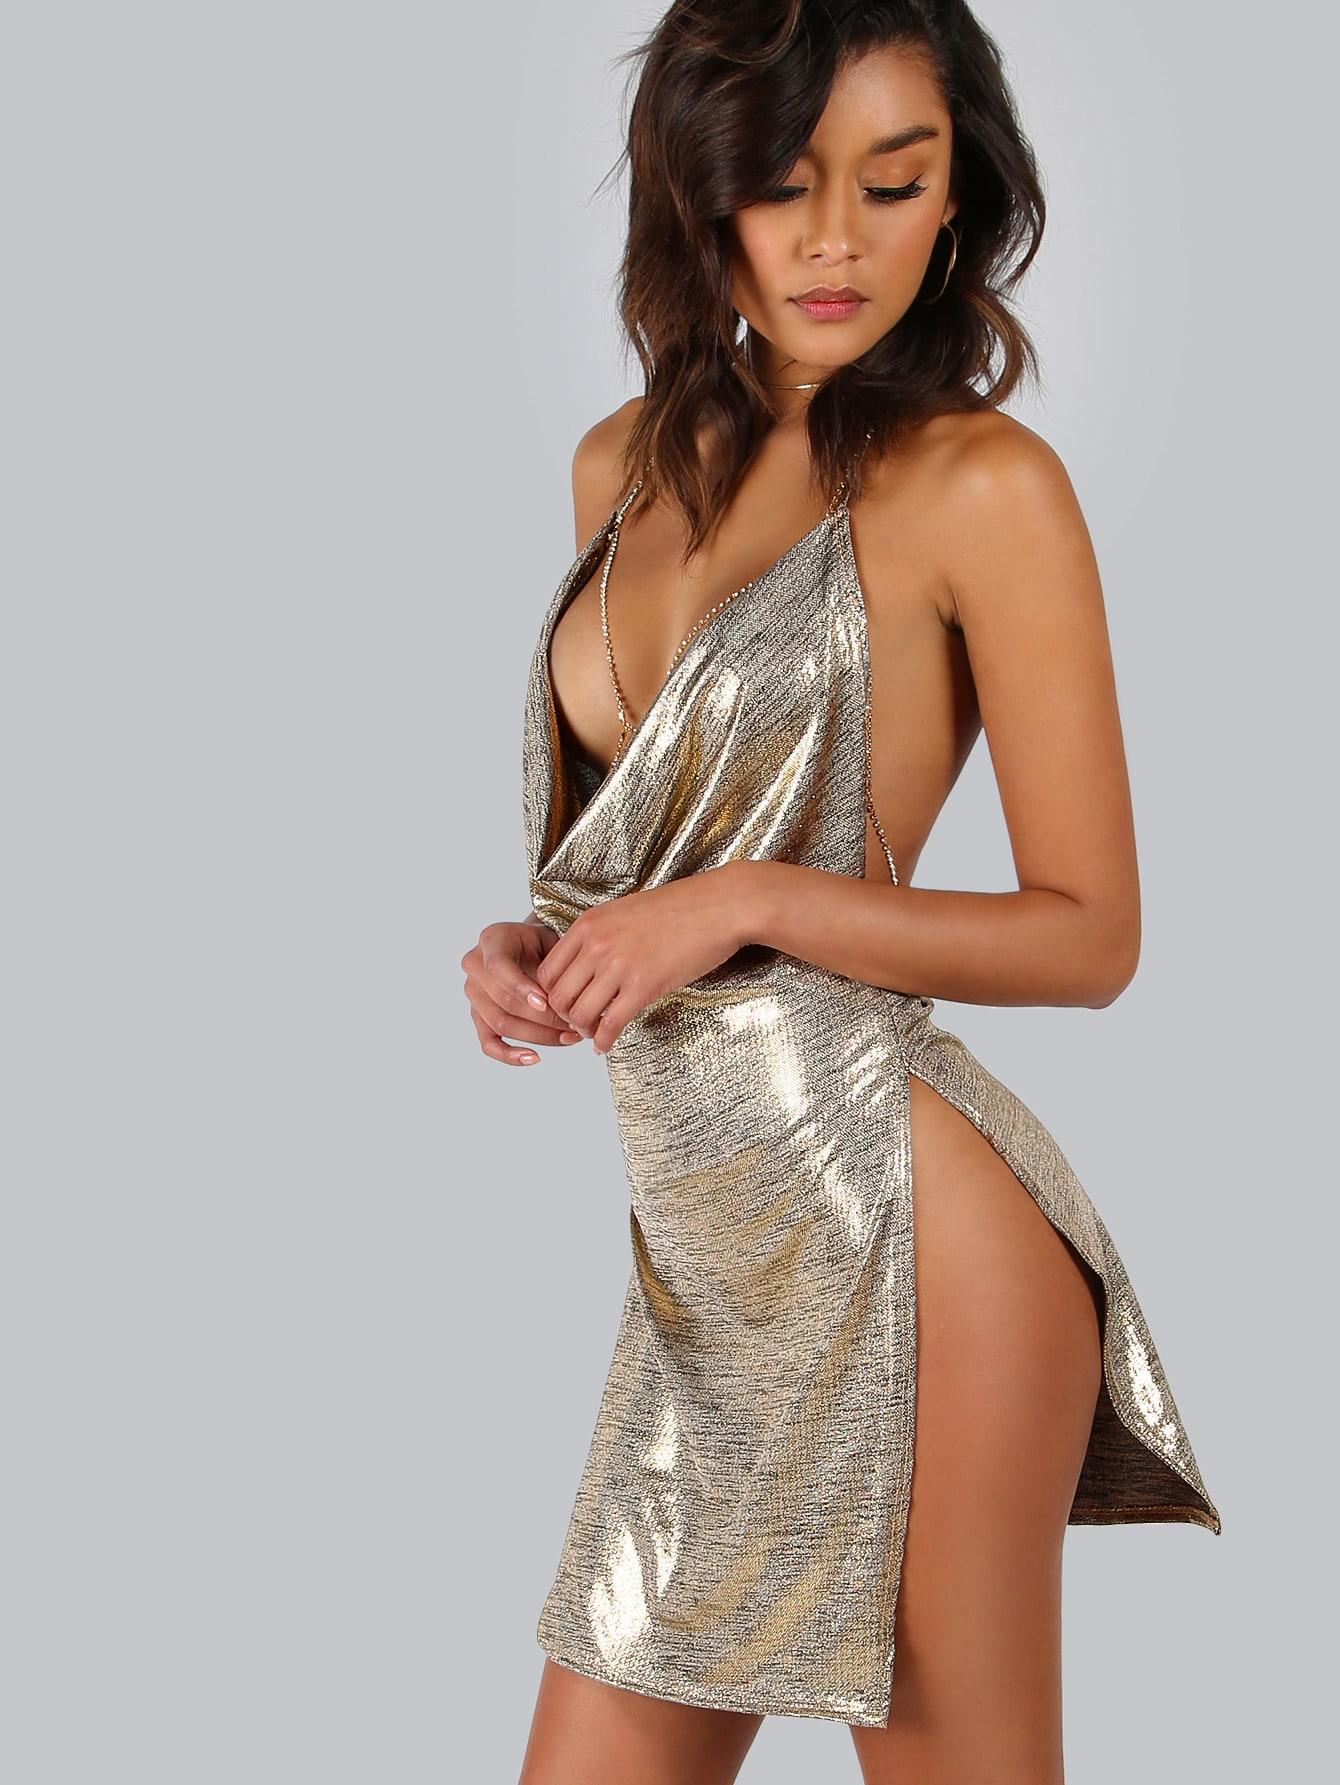 Backless Metallic Plunge Cowl Slit Dress -SheIn(Sheinside)